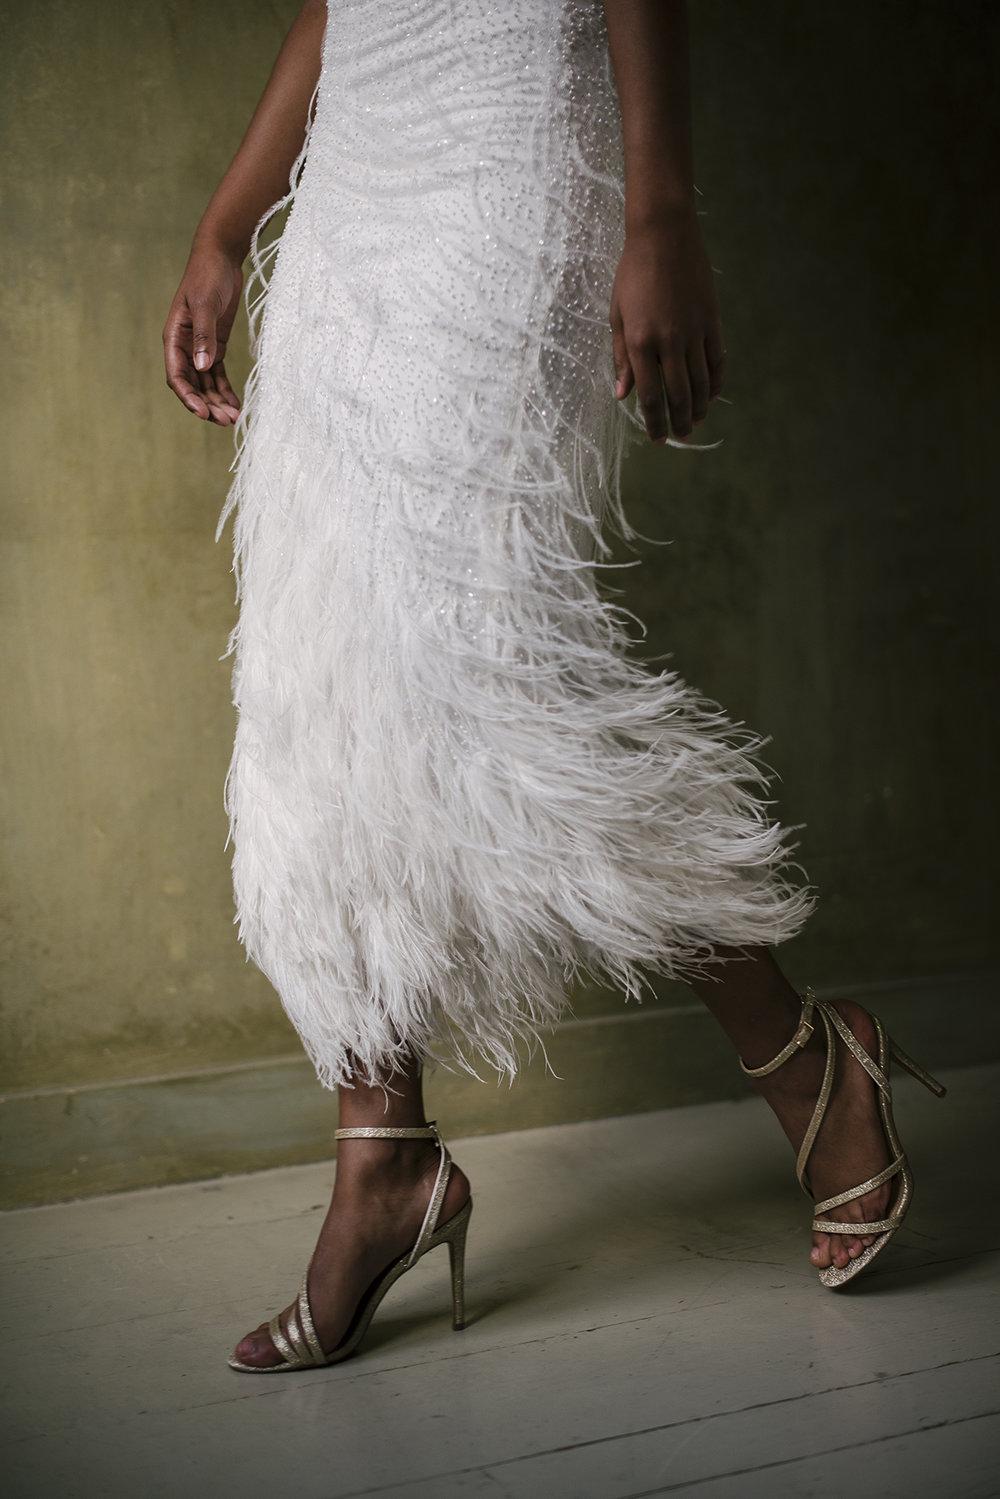 valentine-avoh-robe-mariee-ginger-wedding-dress-bruxelles-photo-elodie-timmermans-39.jpg